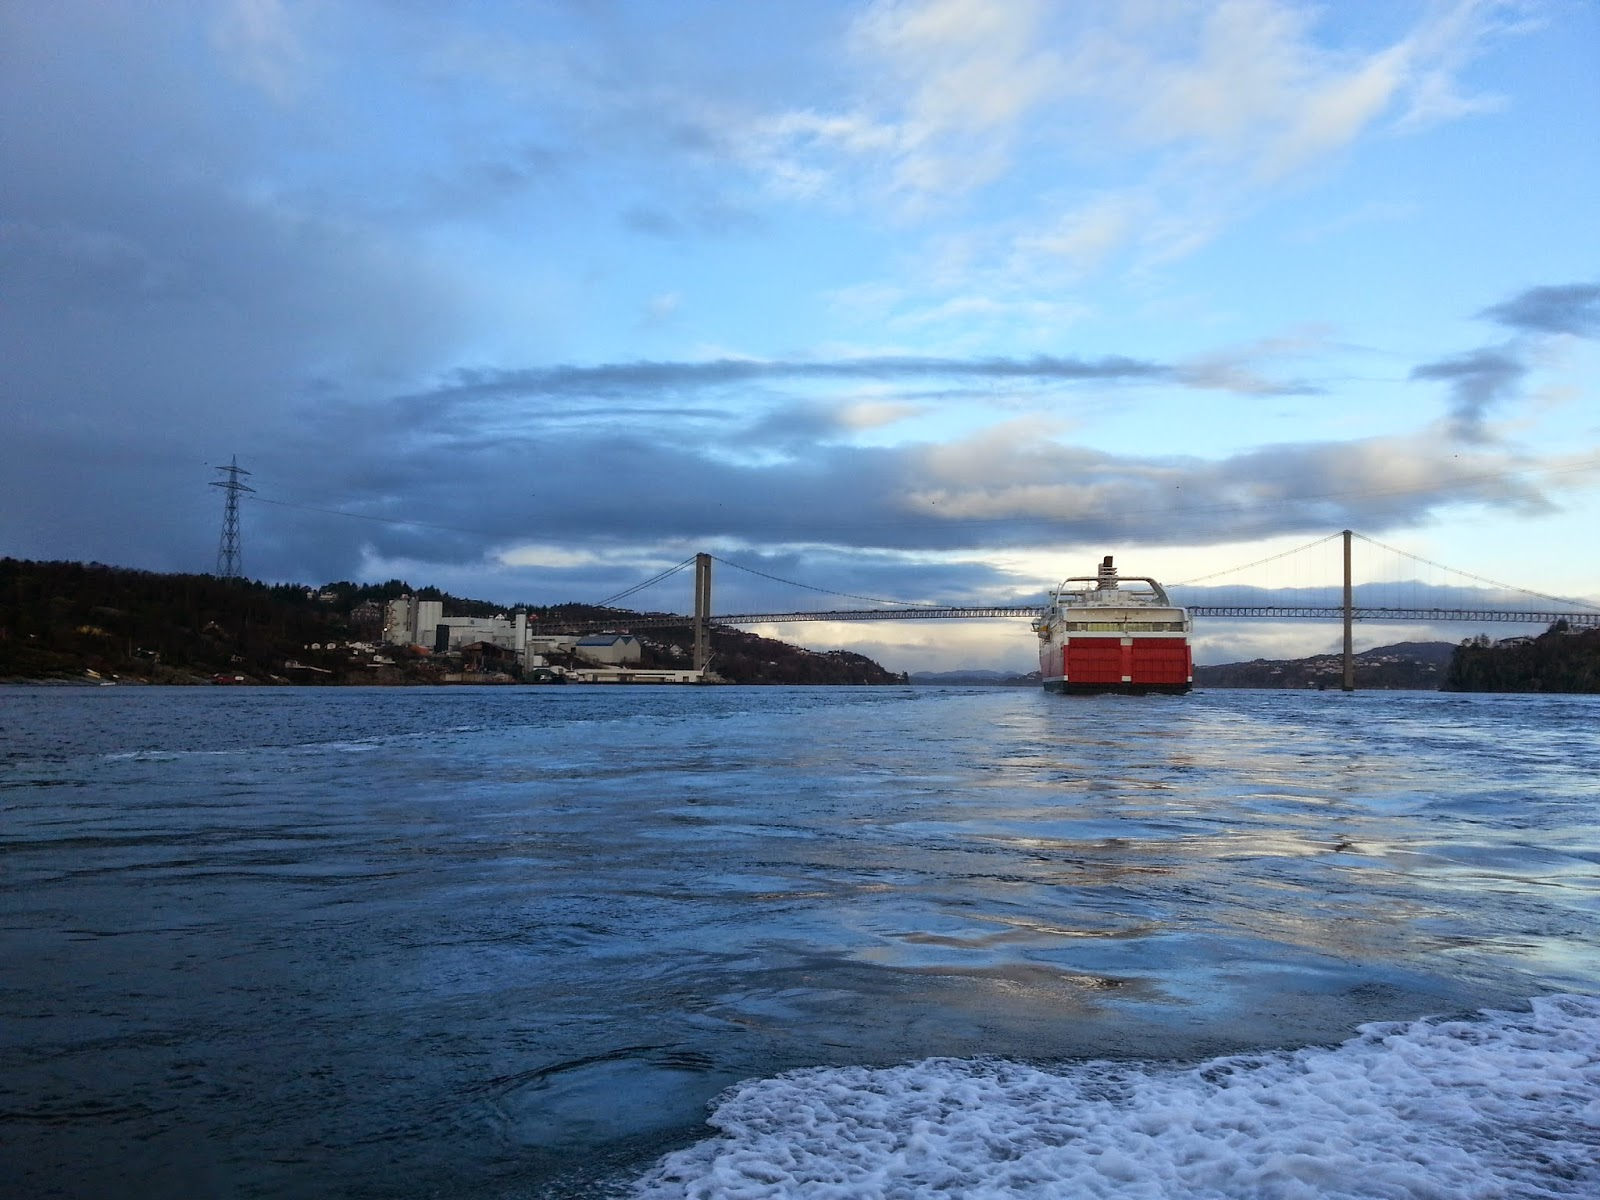 Fjordline Cruise Ferry MS Stavangerfjord in Bergen, Norway